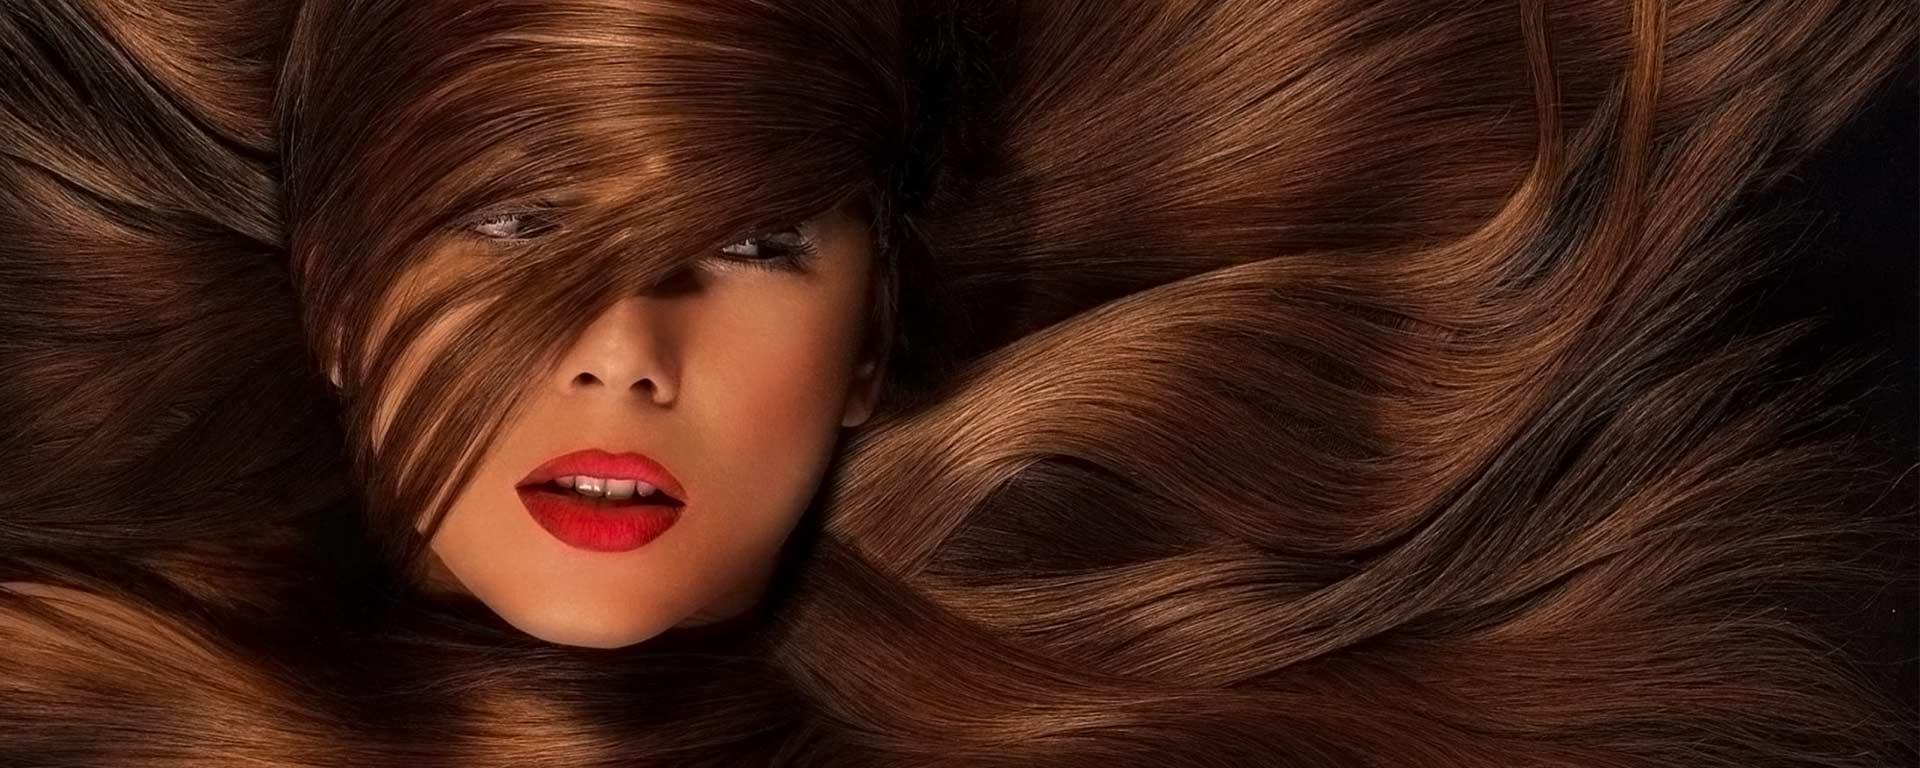 داروی تقویت مو و درمان ریزش مو <span>امیلا</span>